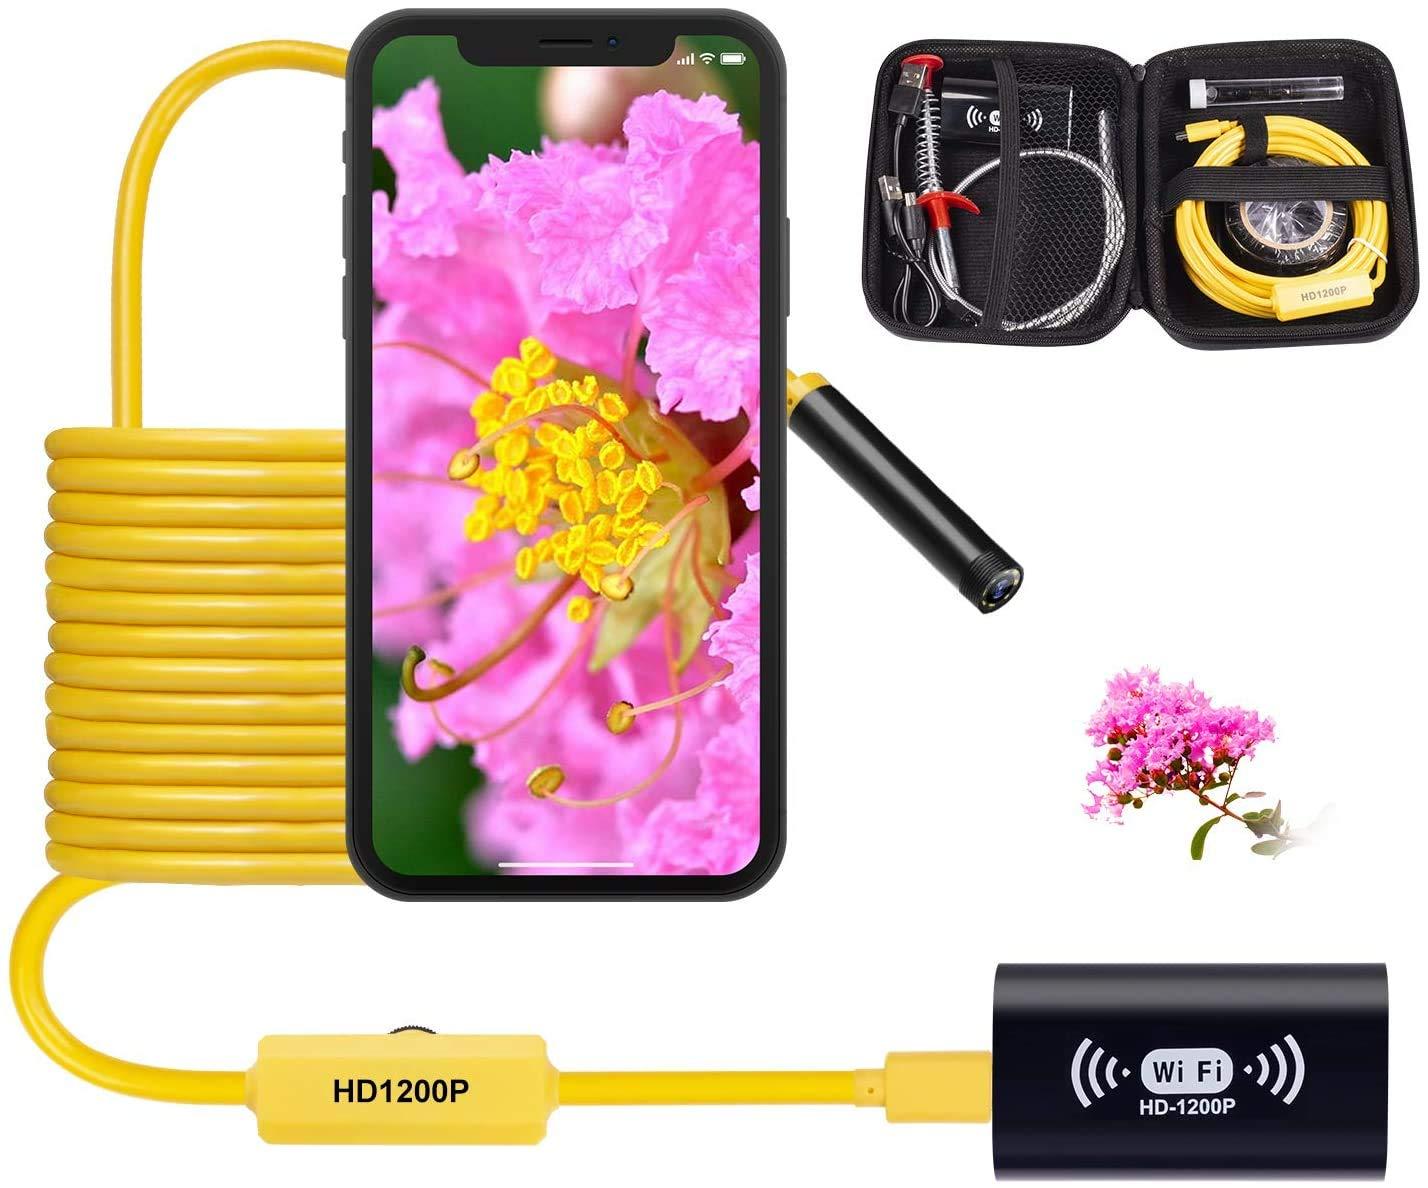 Wireless Endoscope Camera WiFi Borescope Inspection Snake Camera 1200P Waterproof Semi-Rigid Wireless Endoscope for Android iOS Mac Windows by Austone (16.4FT)